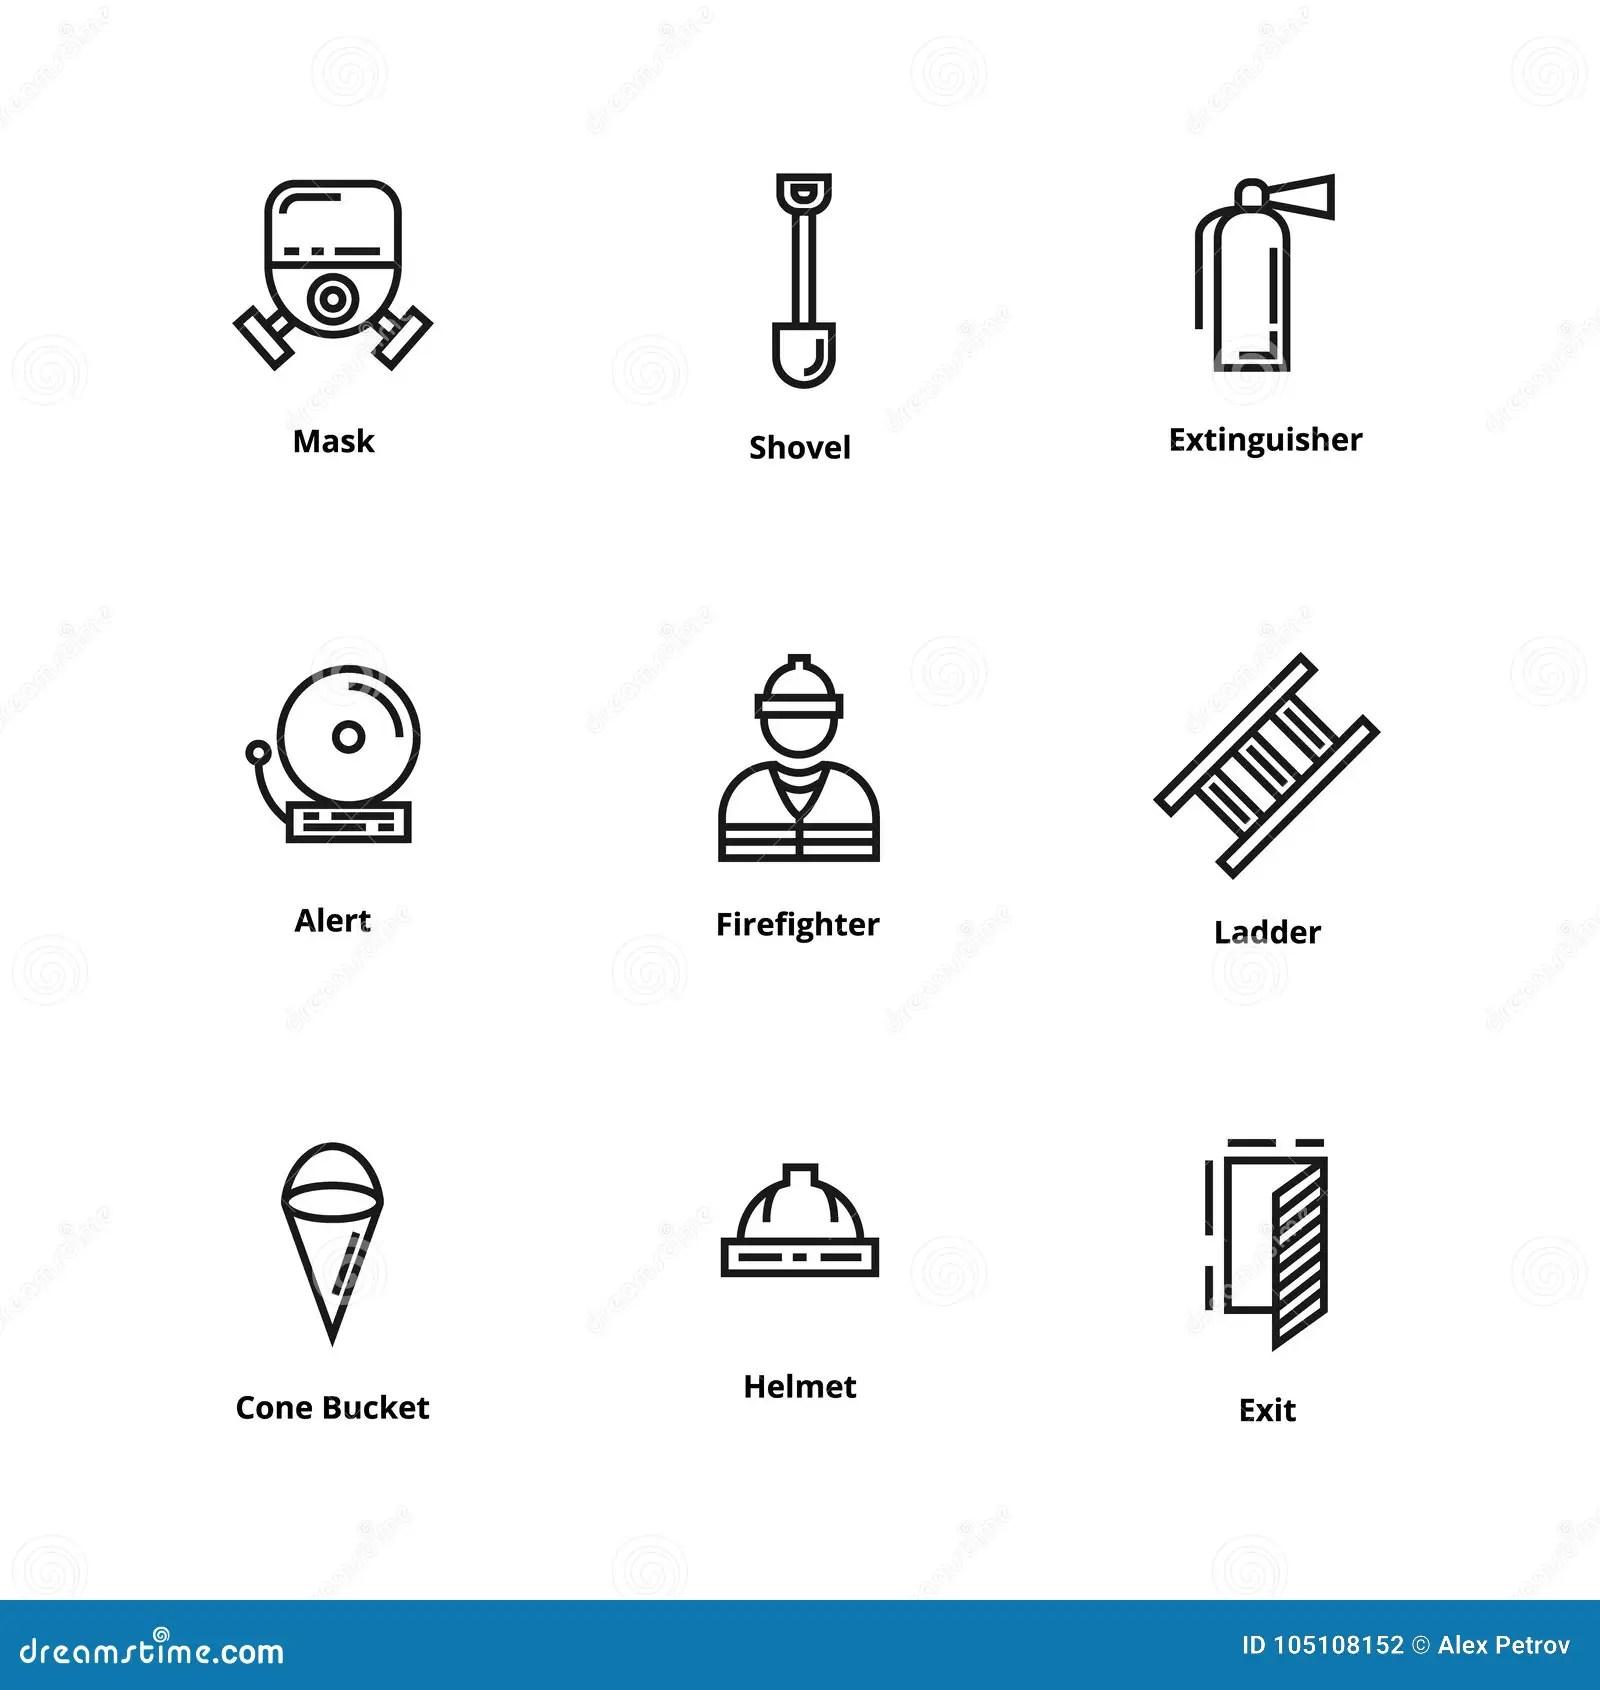 9 Firefighter Icons Stock Vector Illustration Of Ladder